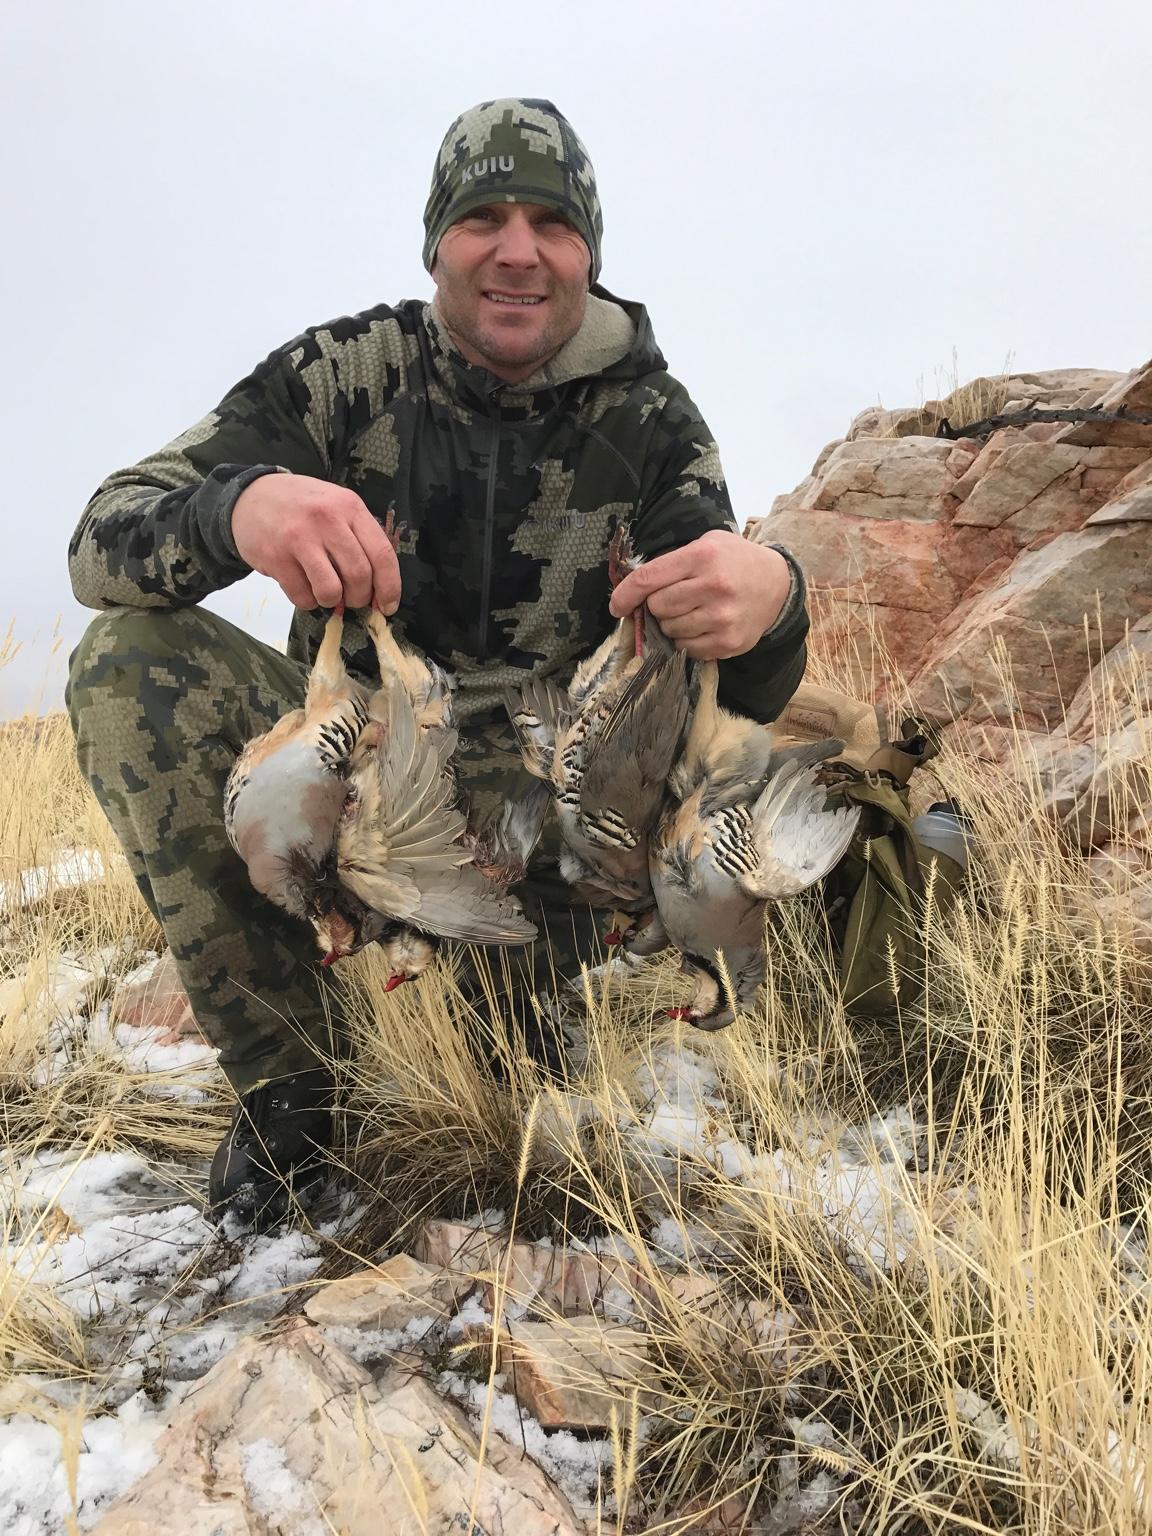 2016 nevada hunting regulations download pdf for Utah fishing regulations